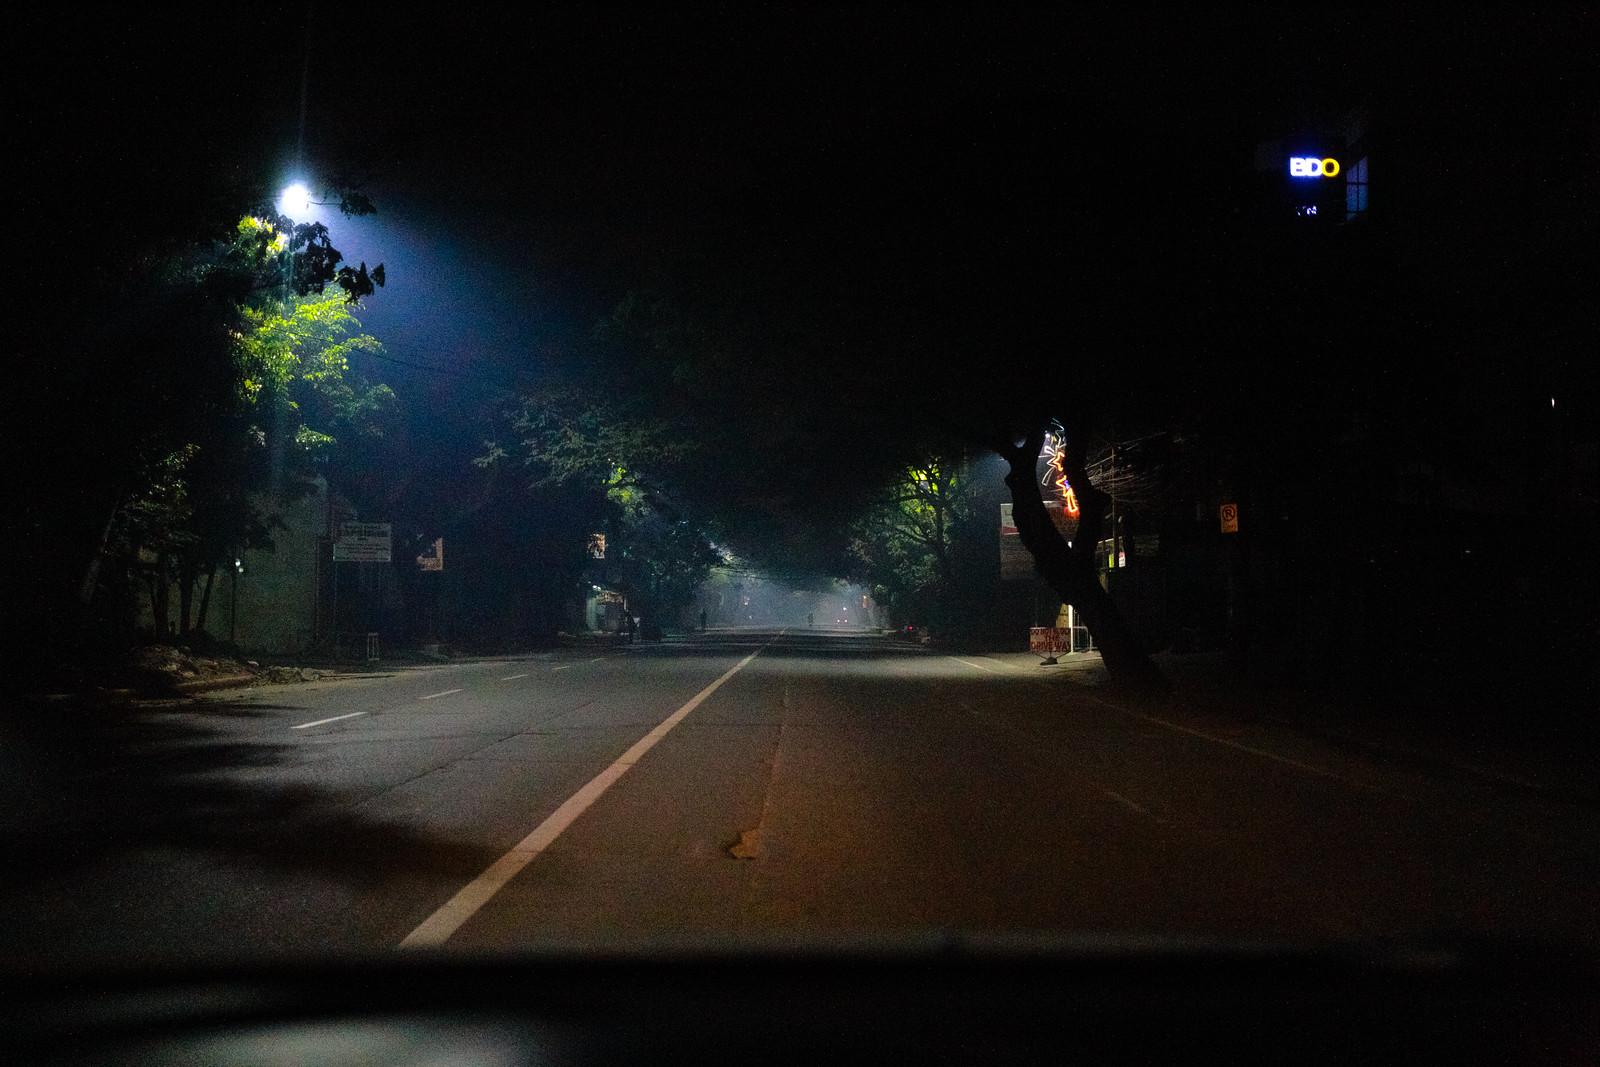 Hazy Road Ahead